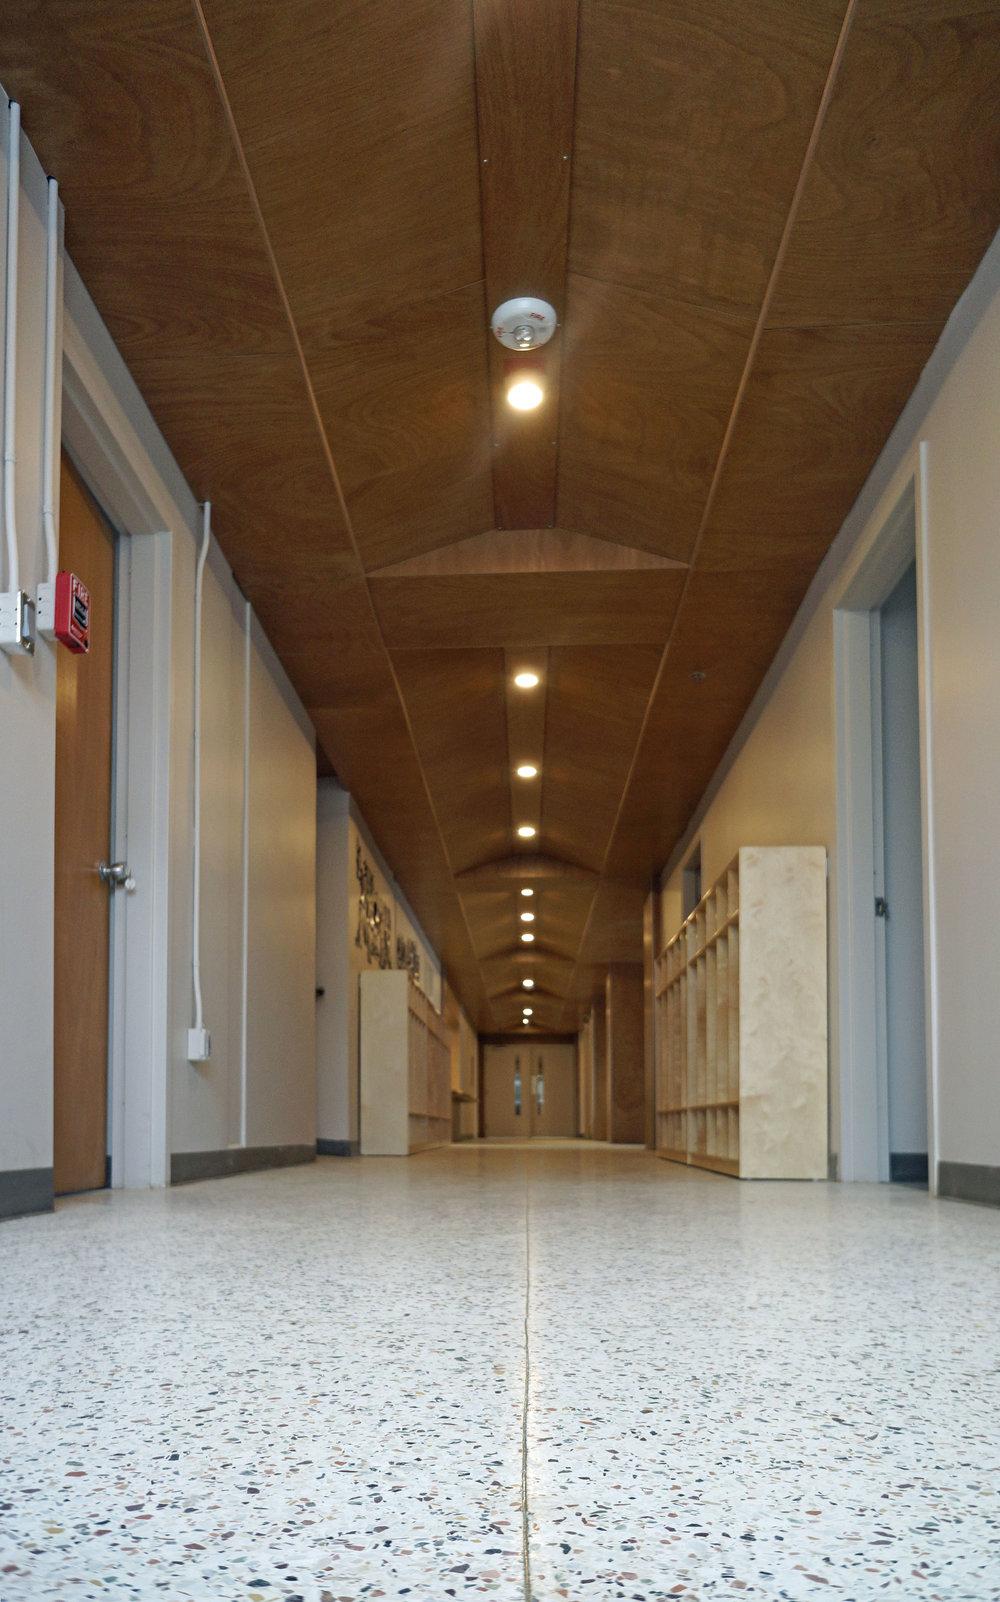 JPII-Floor 1 & 2 - Main floor hall1.jpg